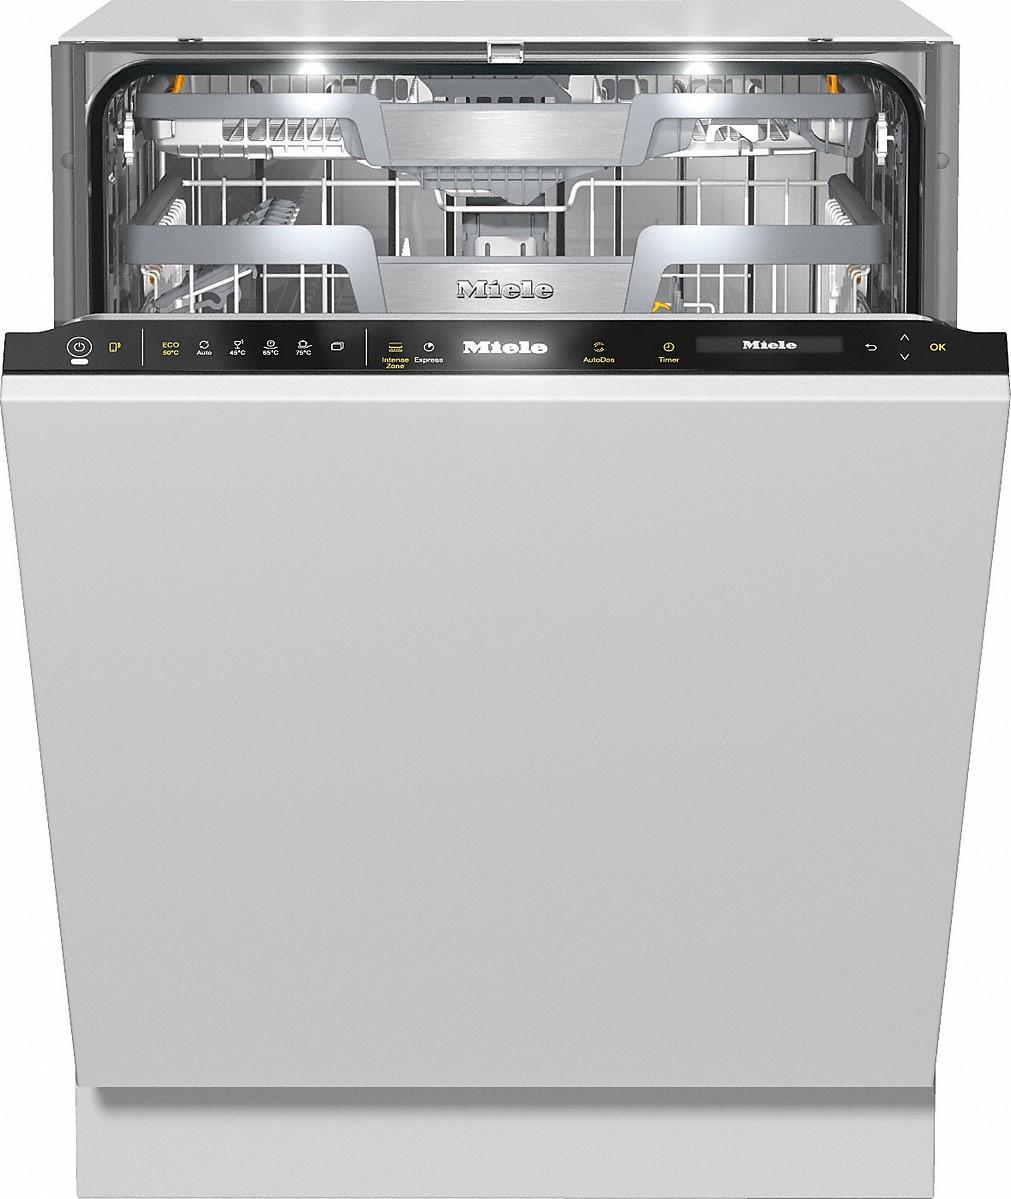 Miele G 7590 SCVI Vollintegrierter Geschirrspüler CleanSteel/Obsidianschwarz